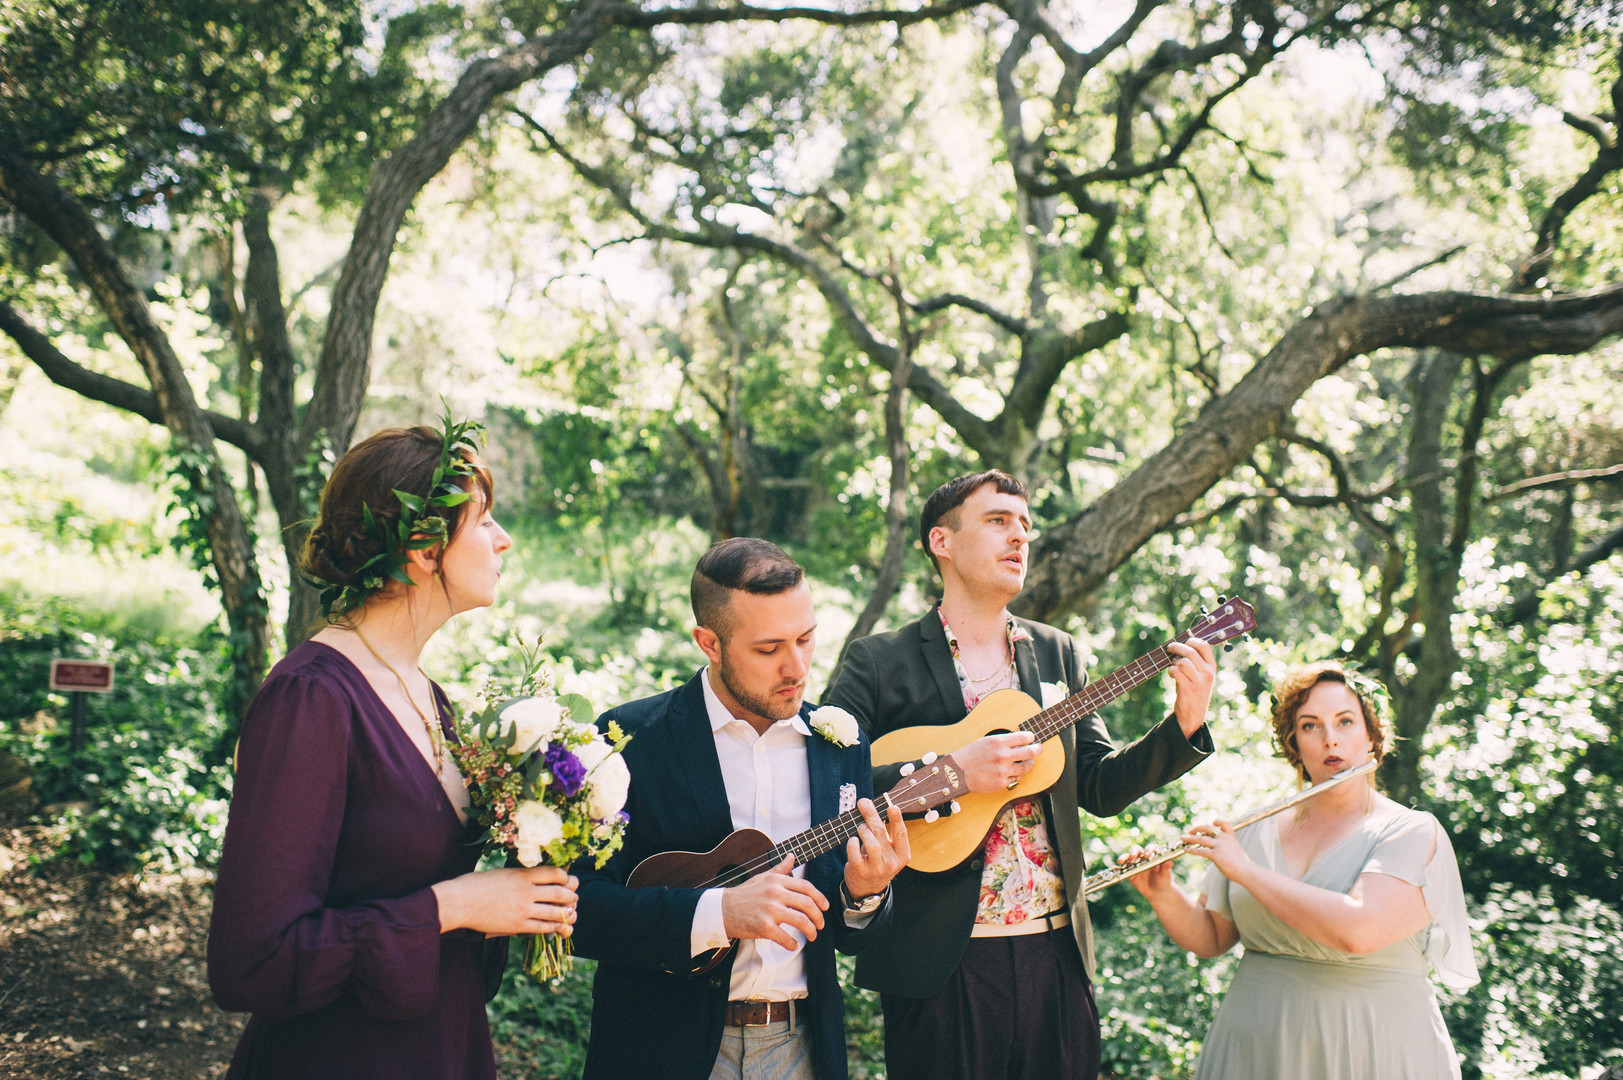 www.santabarbarawedding.com | Sarah Katherine Davis Photography | Santa Barbara Museum of Natural History | Wild Heart Events | Ella and Louie | Ceremony Music